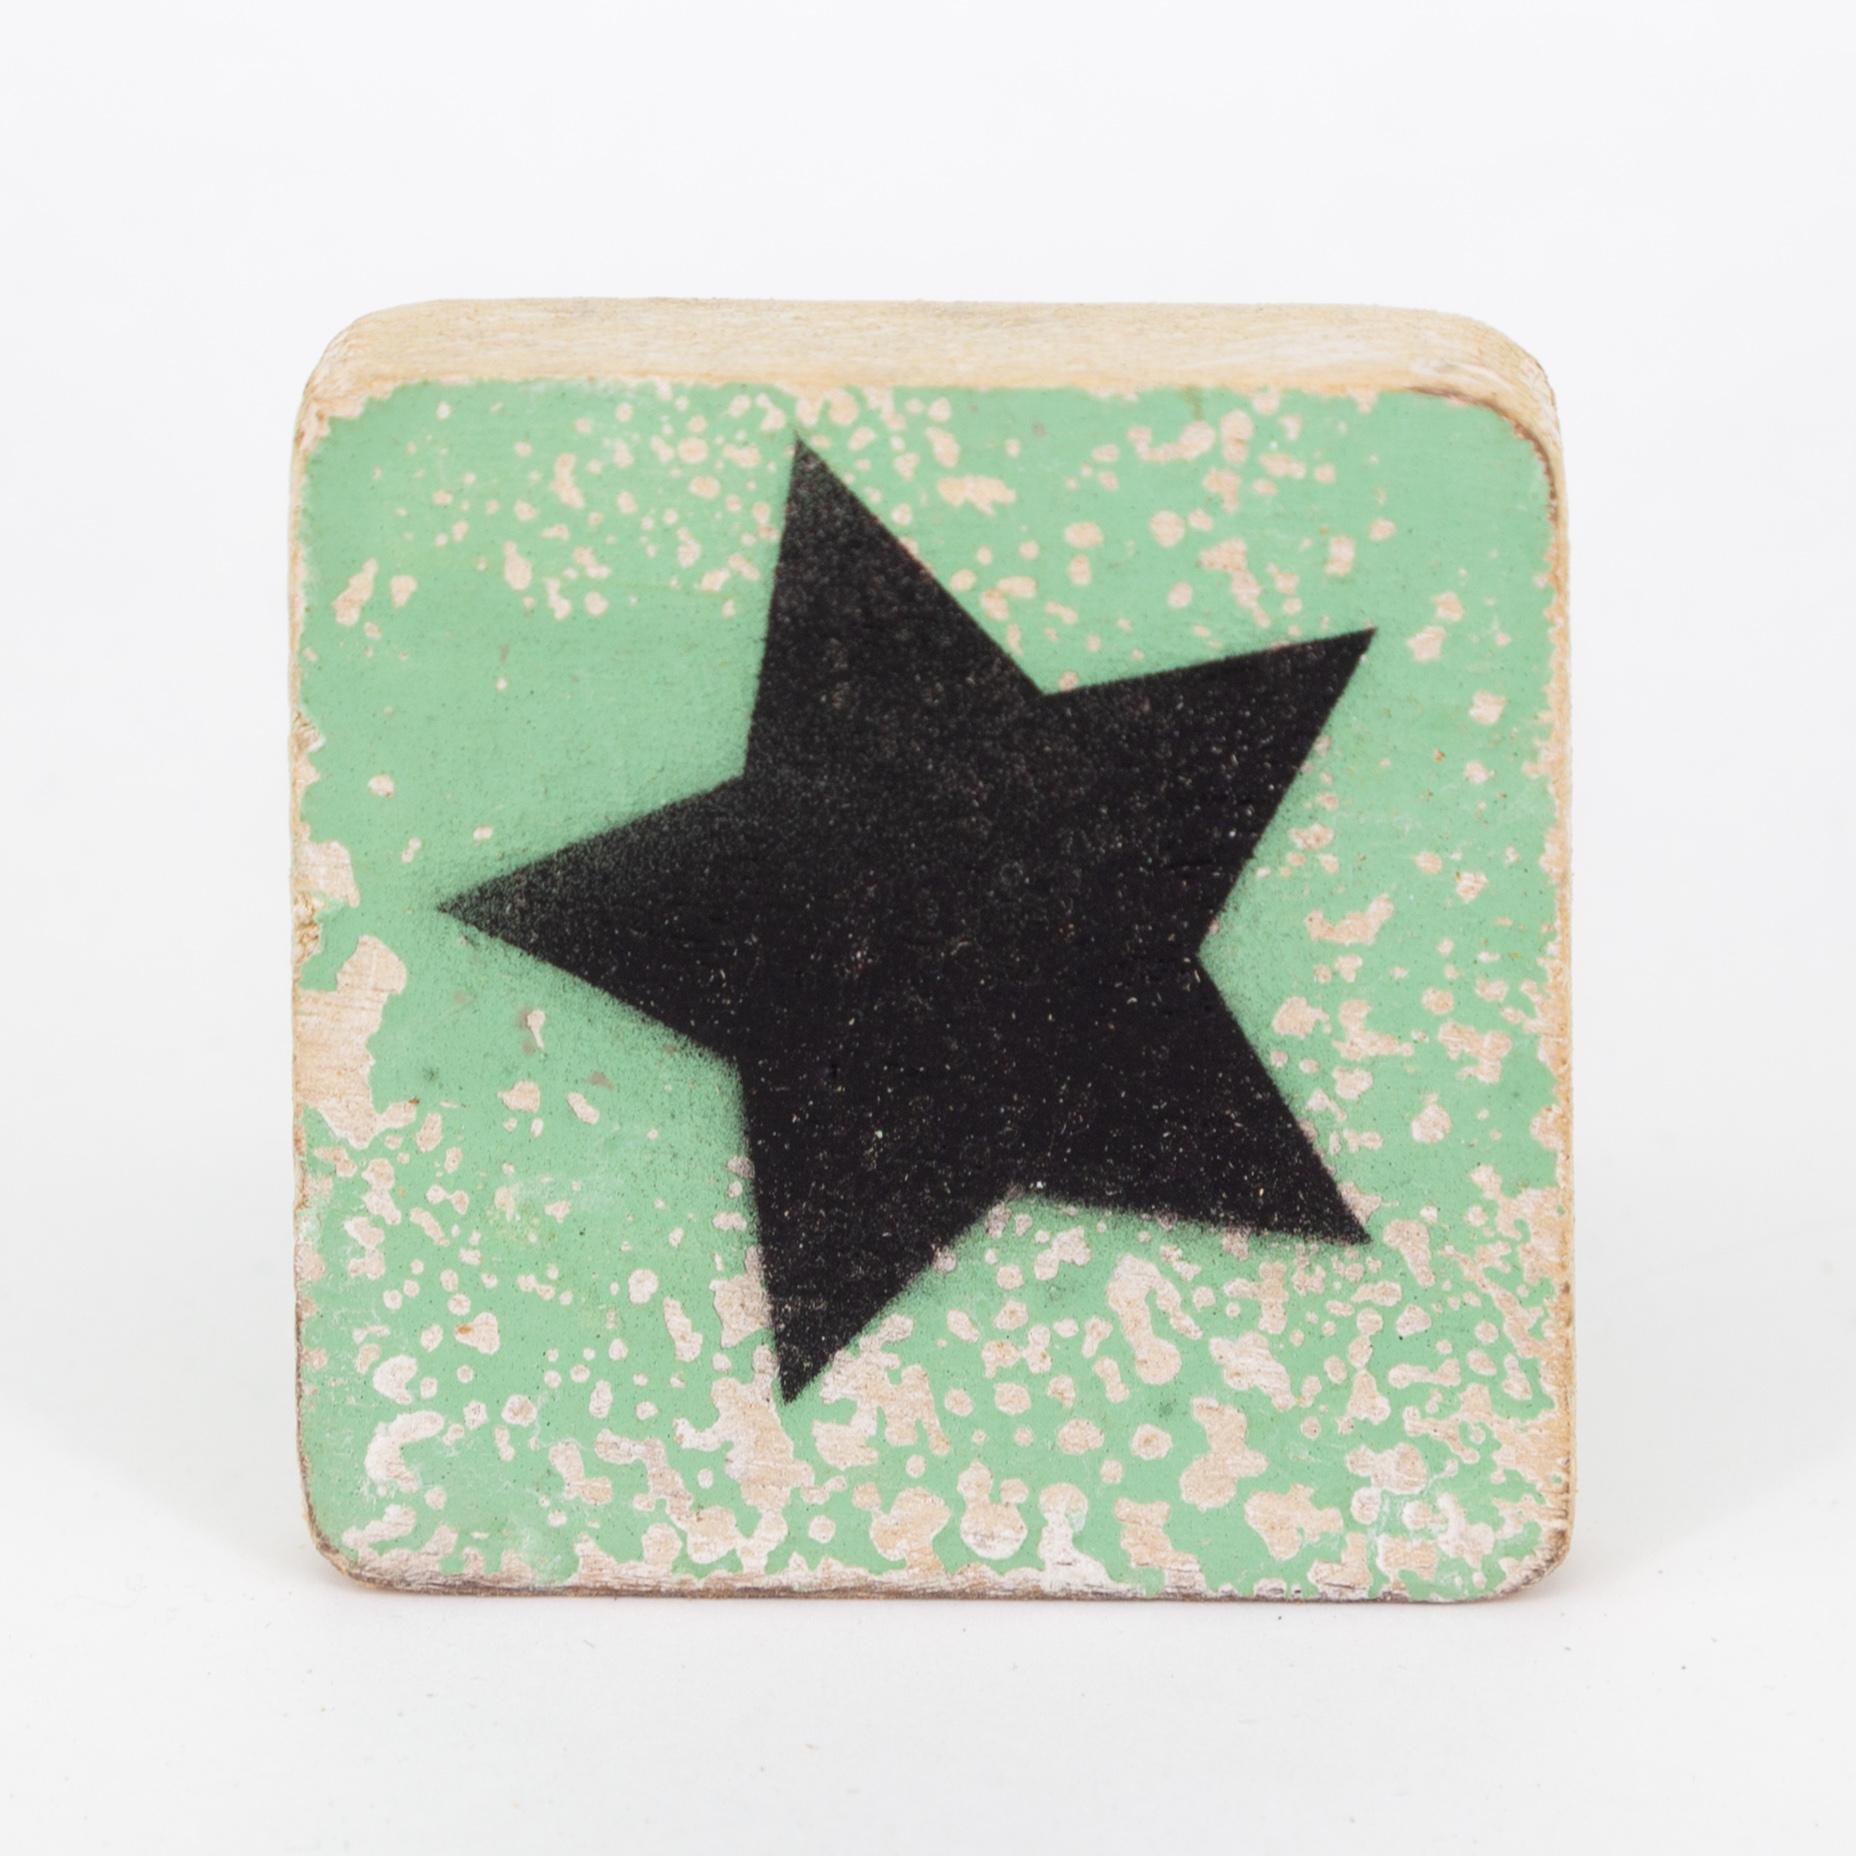 Holzsymbol - Stern - im Scrabble-Style